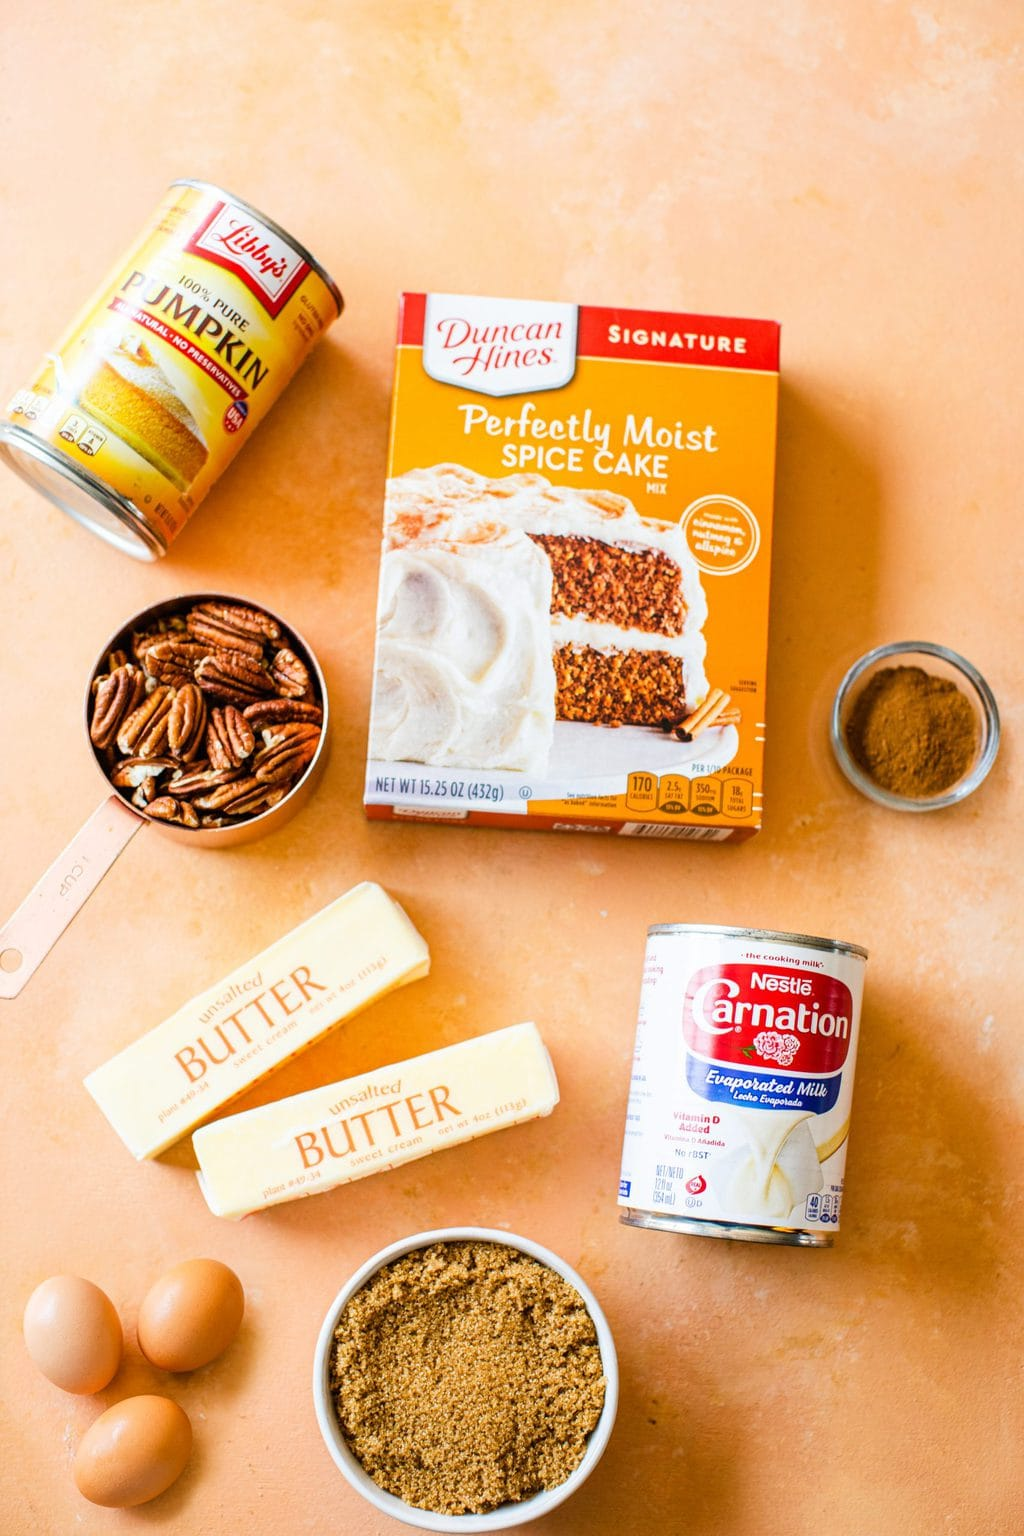 pumpkin puree, pecans, butter, eggs, brown sugar, spice cake mix, evaporated milk, pumpkin pie spice